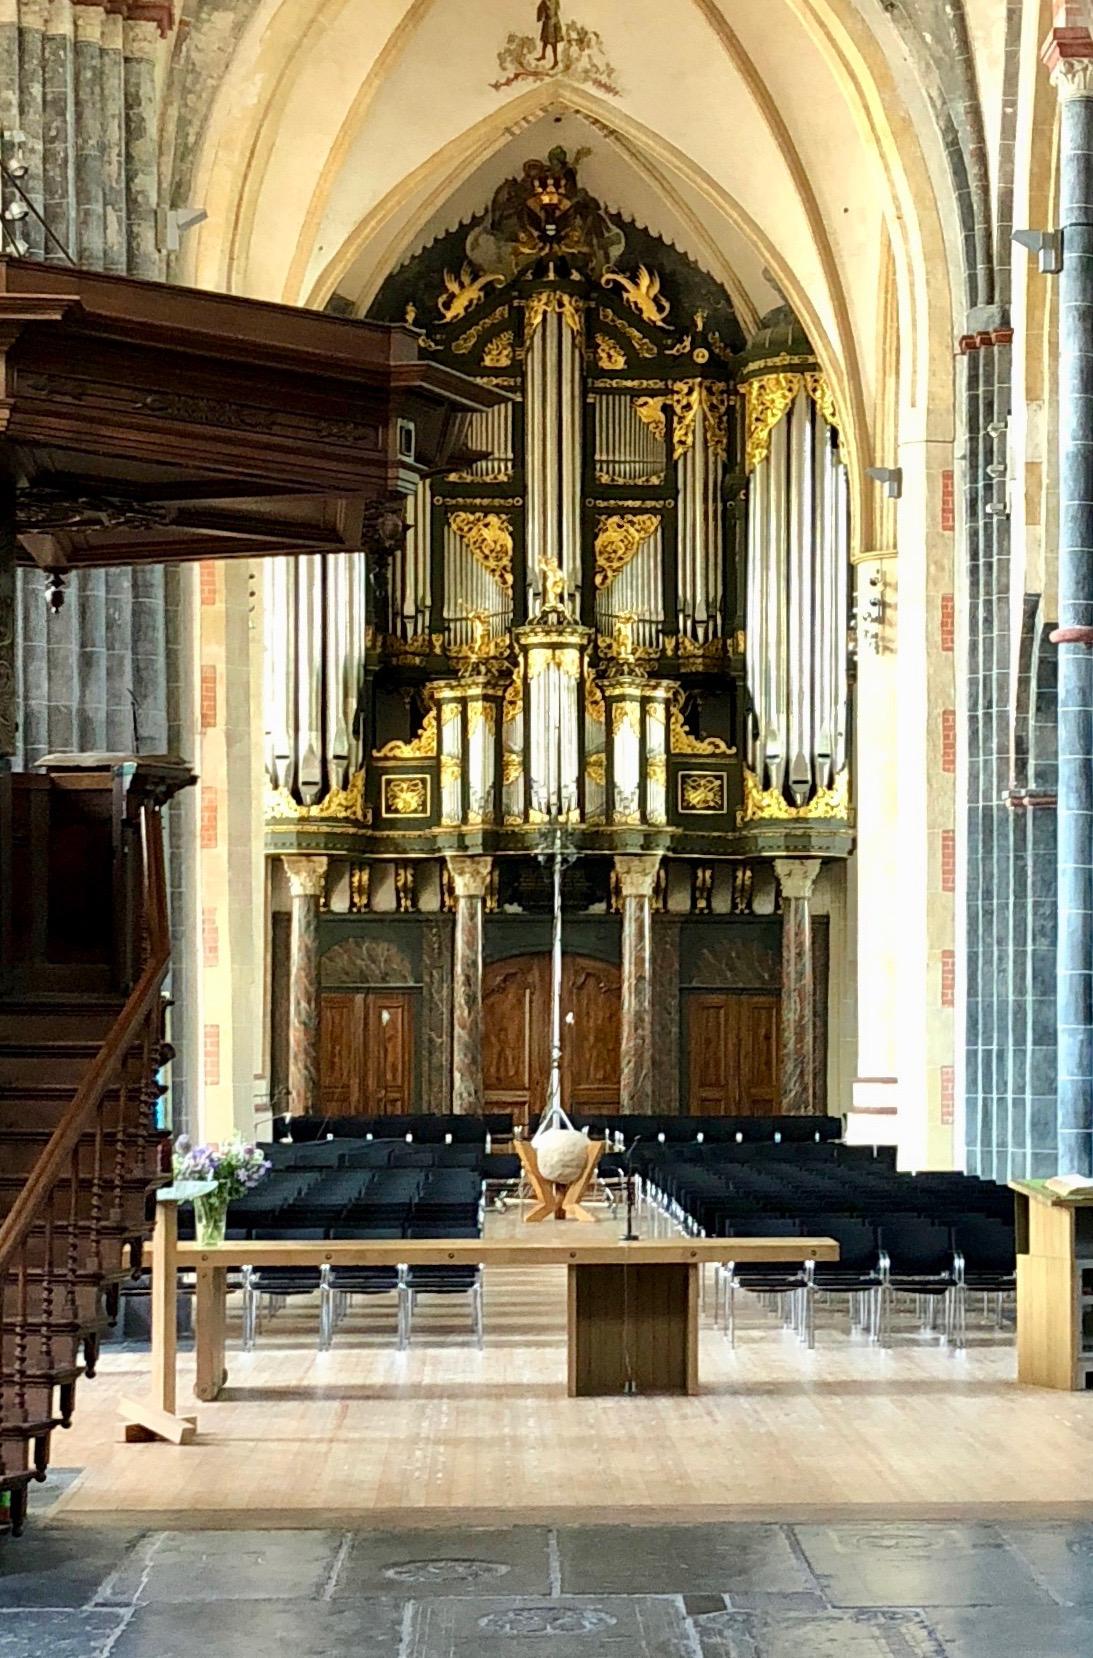 1692 Arp Schnitter organ as viewed from the Quire, Martinikerk, Groningen.